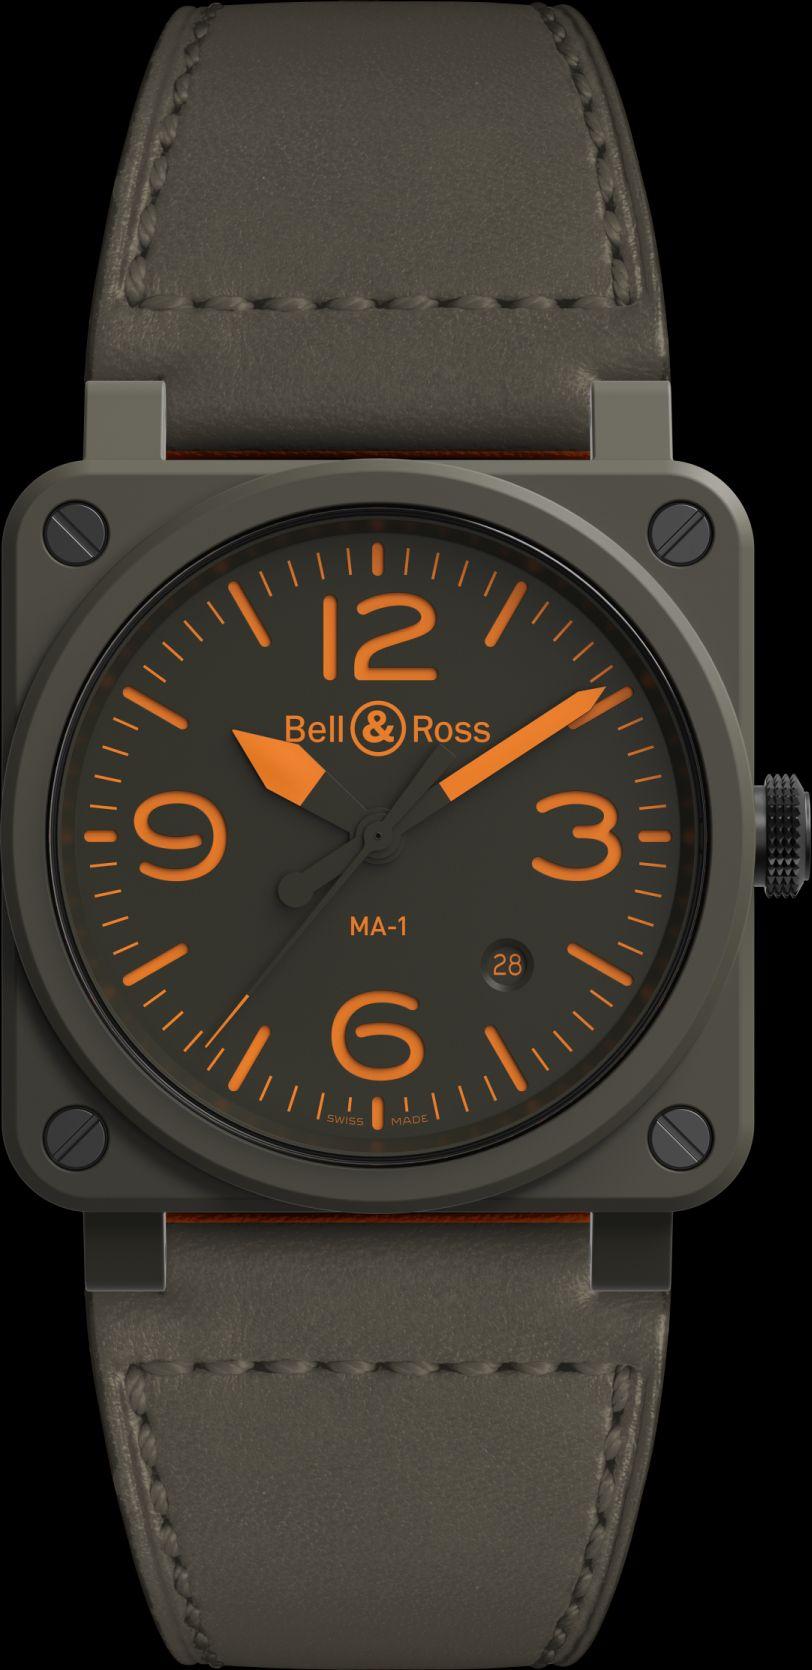 Bell & Ross BR 03-92 MA-1, Bell Ross BR 03-92 MA-1, Bell-Ross-MA-1, Bell-Ross-MA1, Bell Ross BR03-92 MA-1, BR03-92 MA-1, BR03-92 MA1